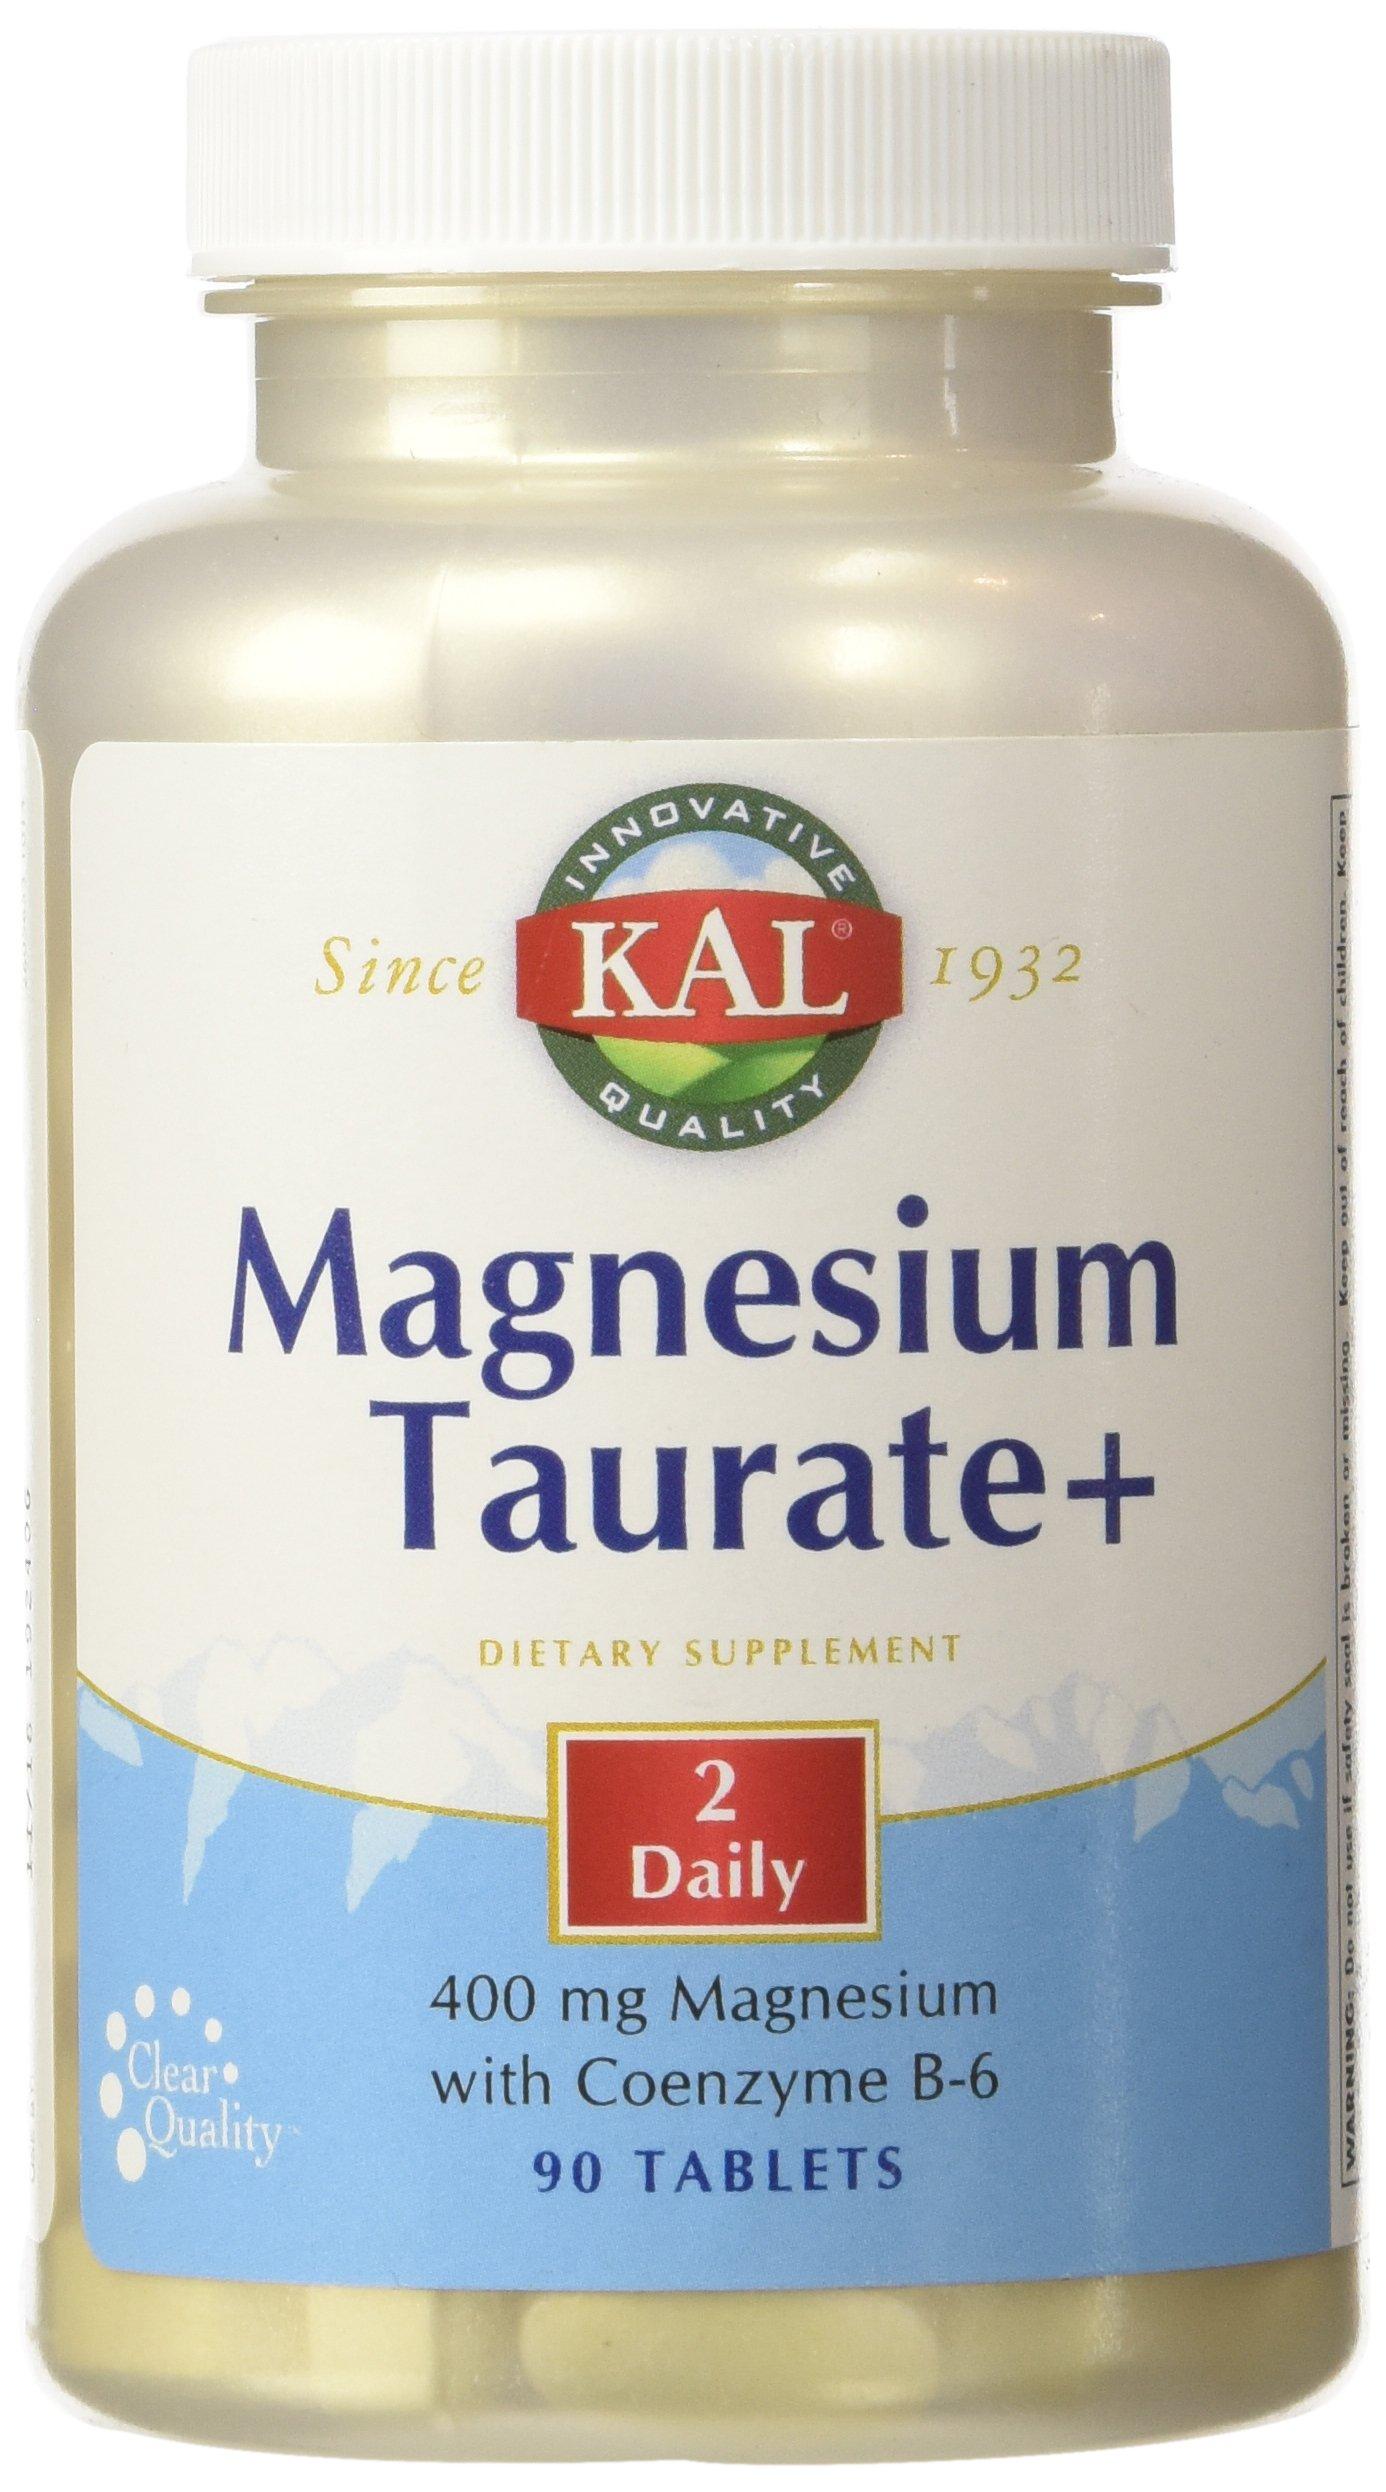 Magnesium Taurate+ Kal 90 Tabs